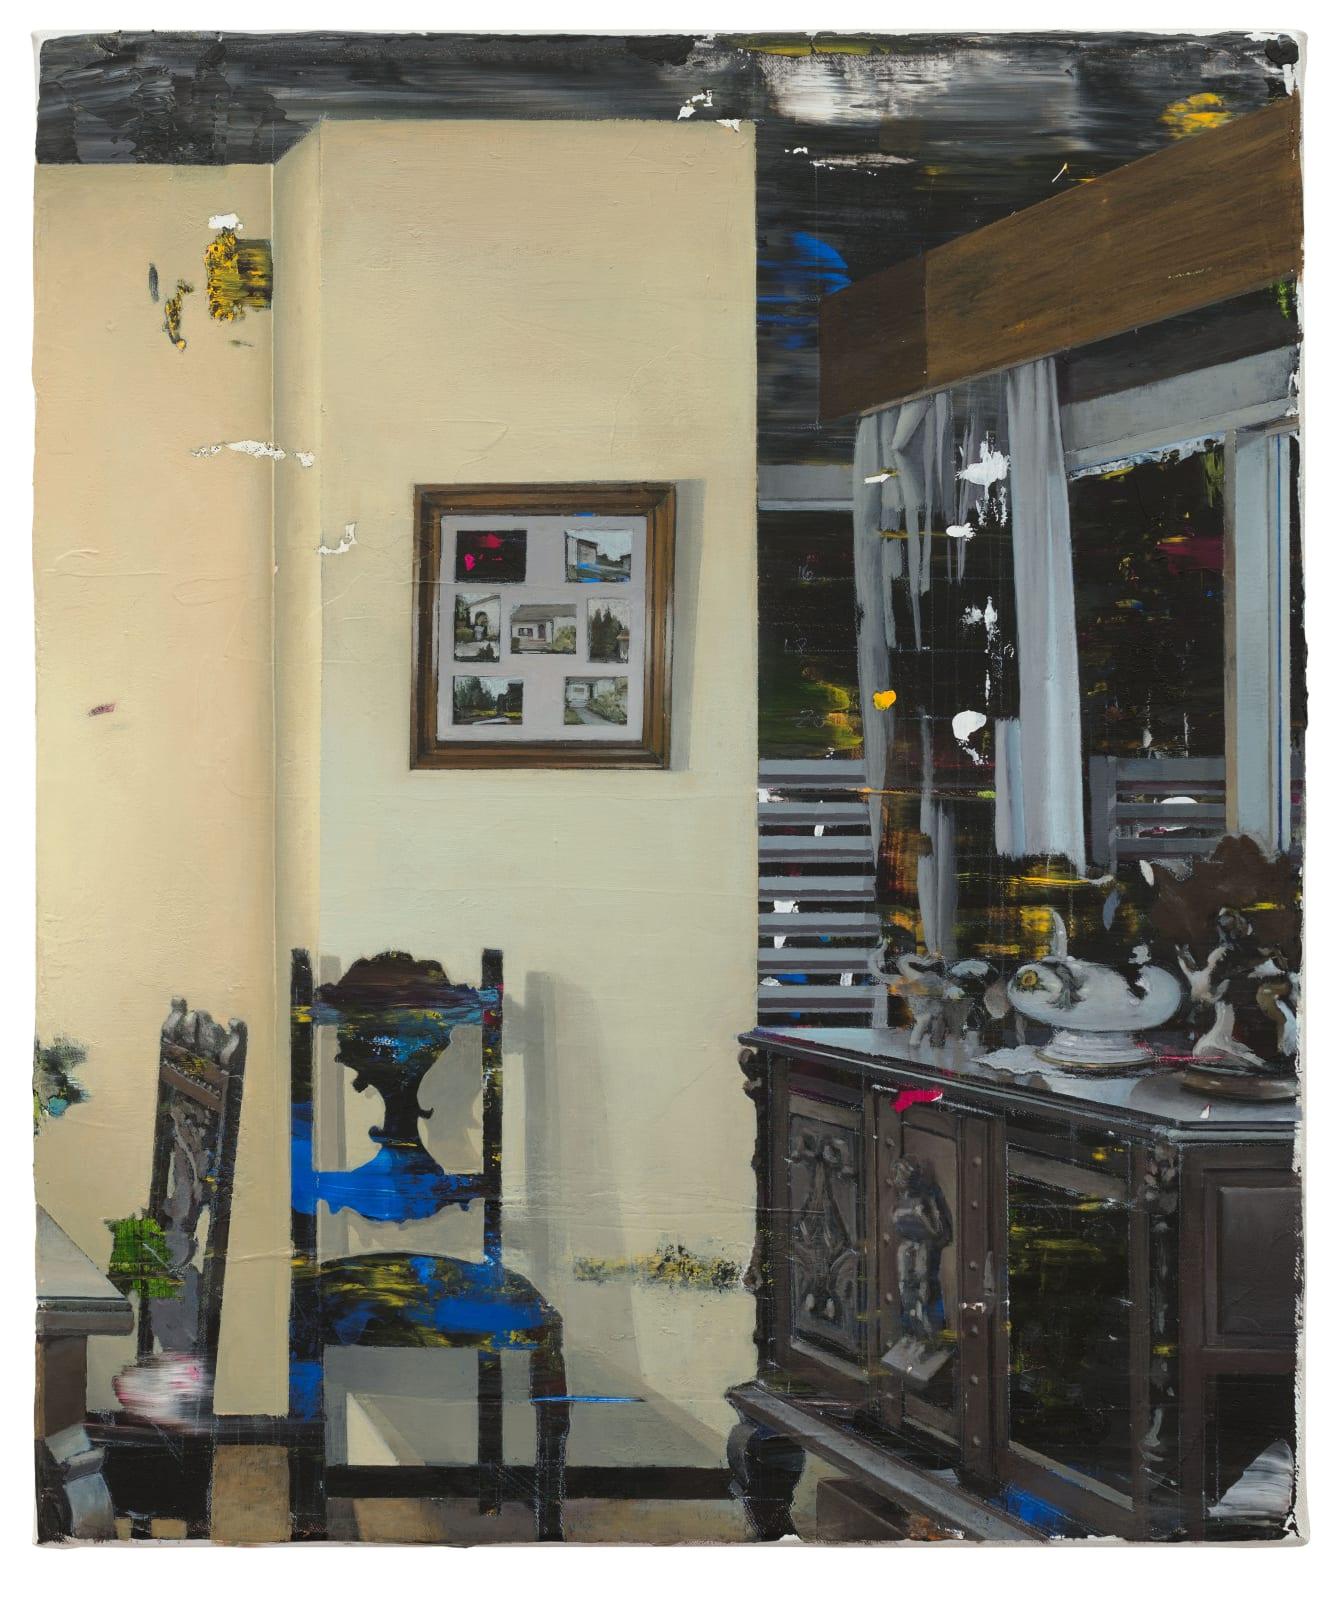 CARLOS SAGRERA - UMHANG - 2017 - ACRYLIC ON CANVAS - 44 X 37 CM